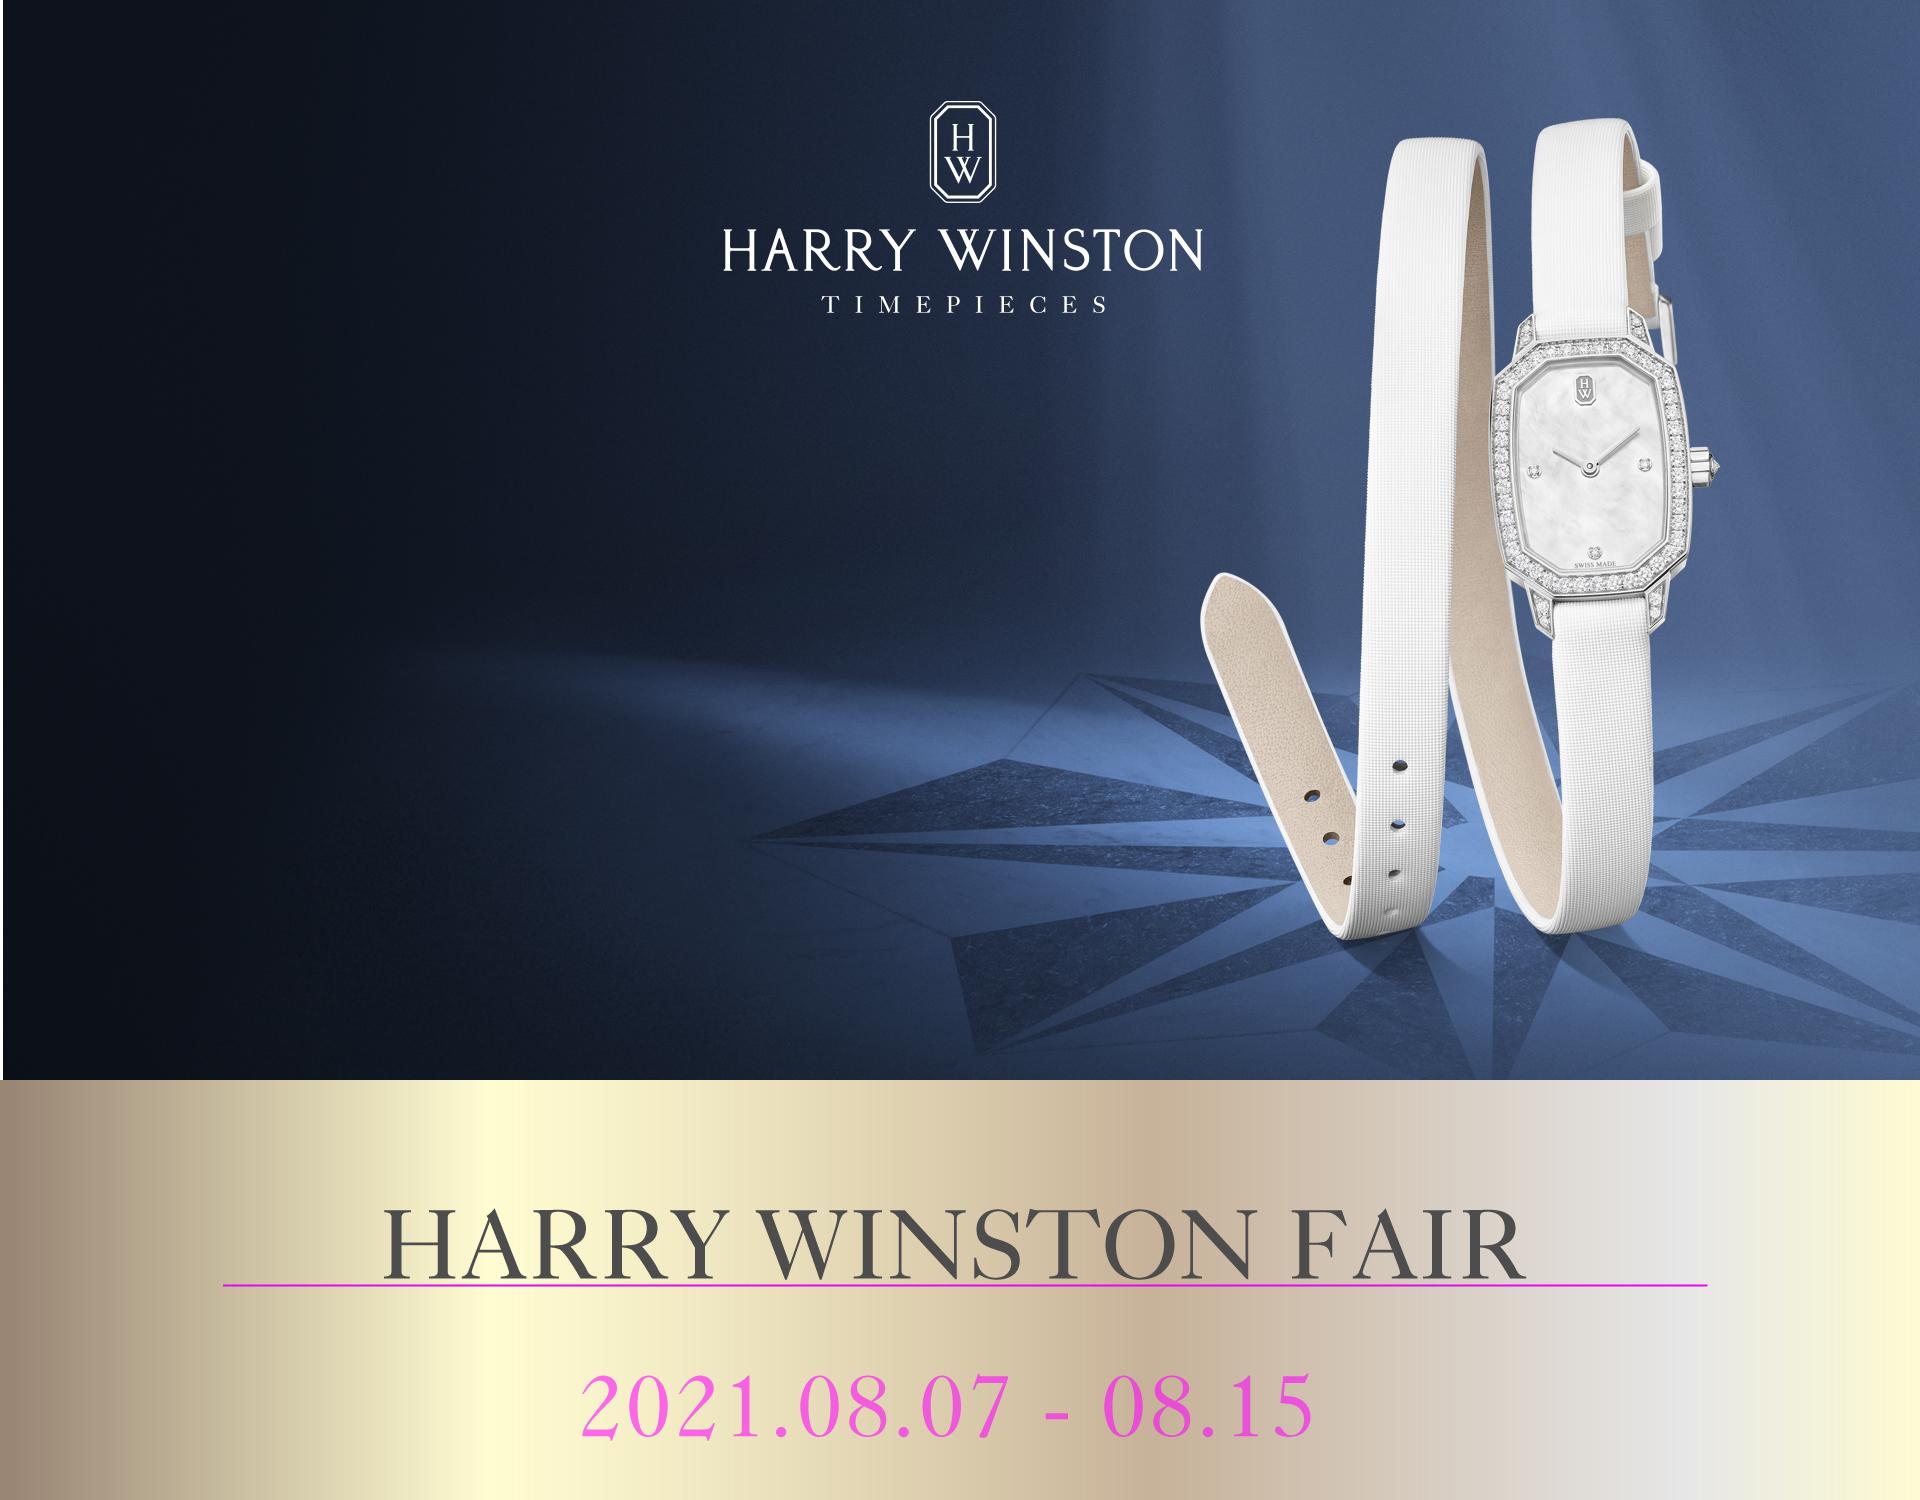 HARRY WINSTON FAIR